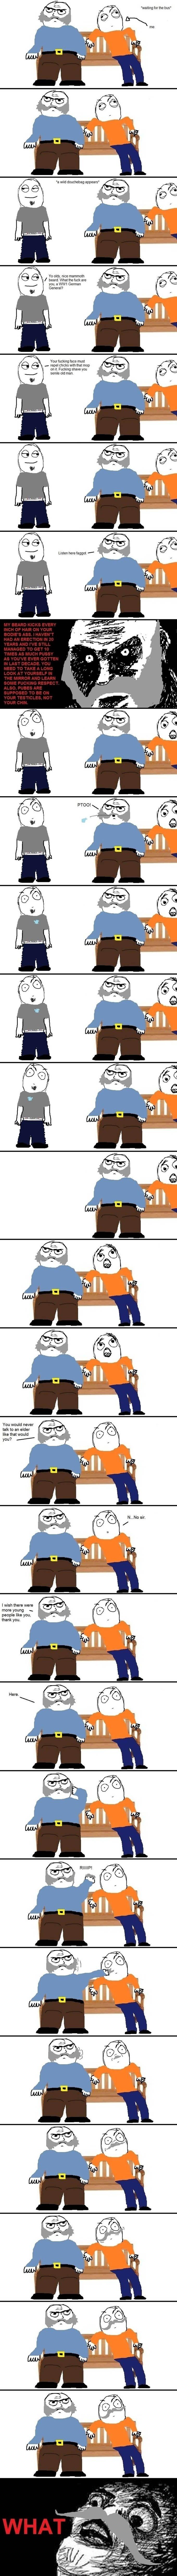 Old People. .. CH-CH-CH-repost. Old People CH-CH-CH-repost